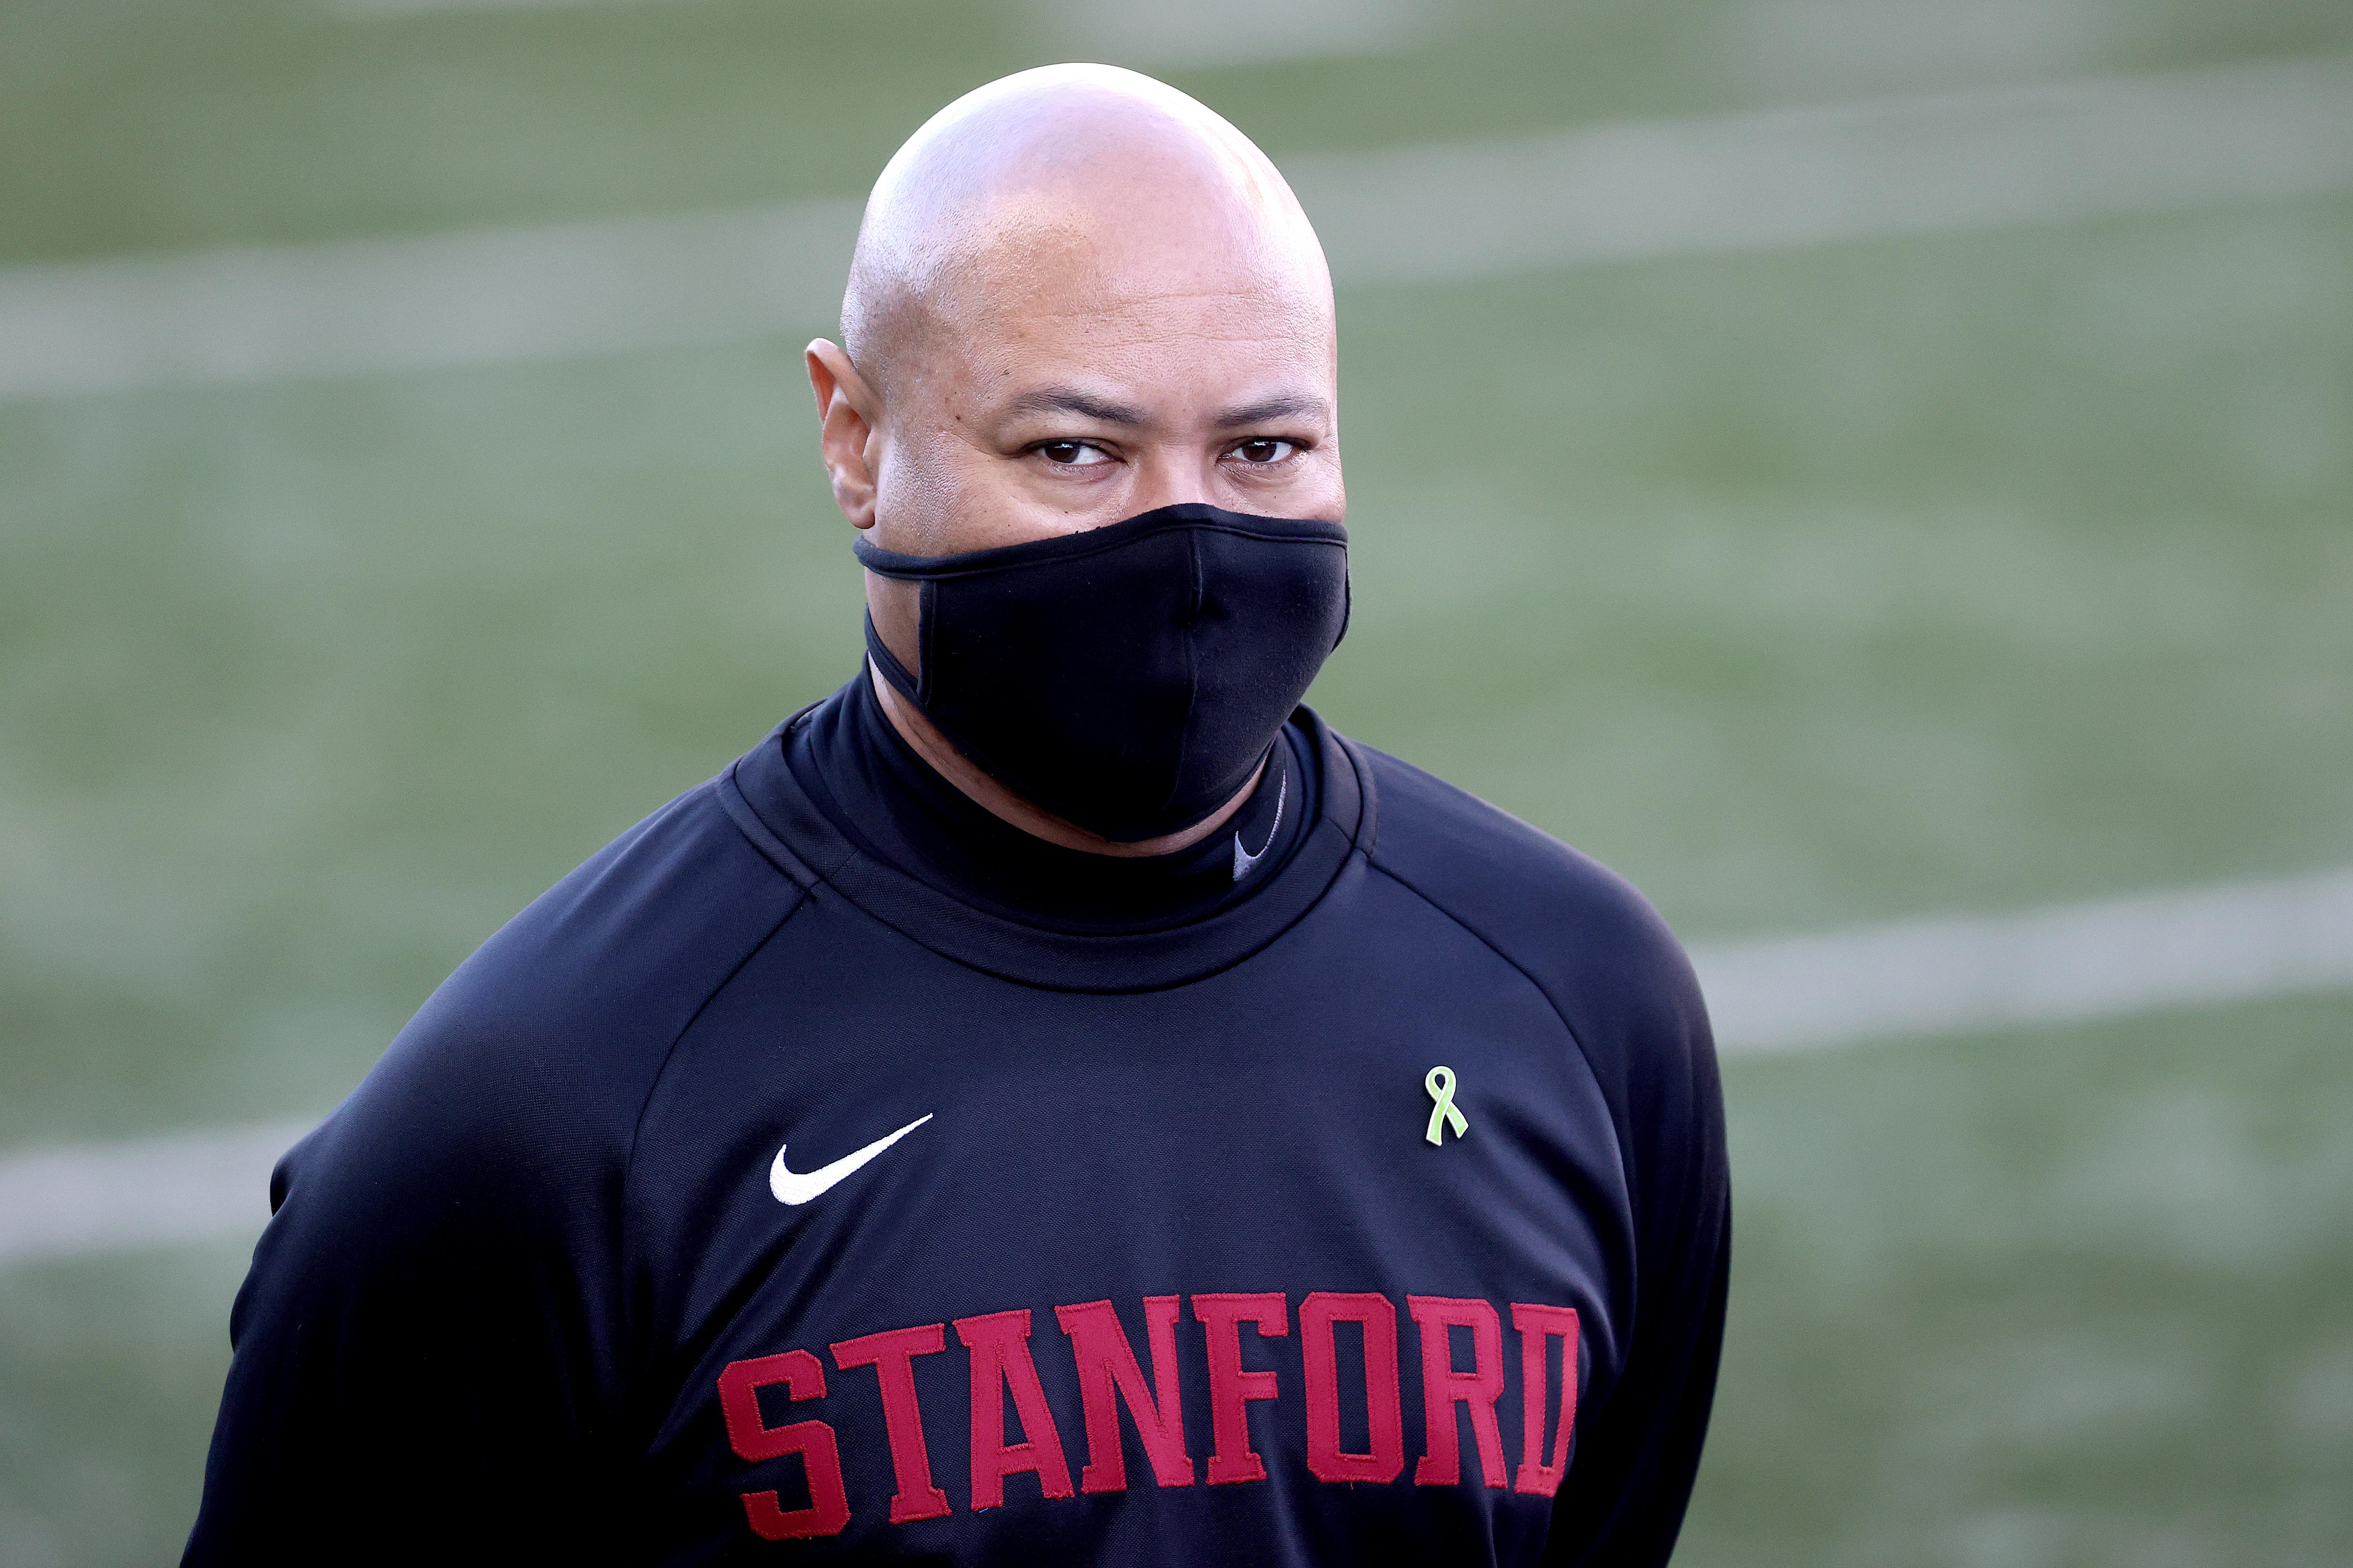 That mask isn't muzzling David Shaw right now.